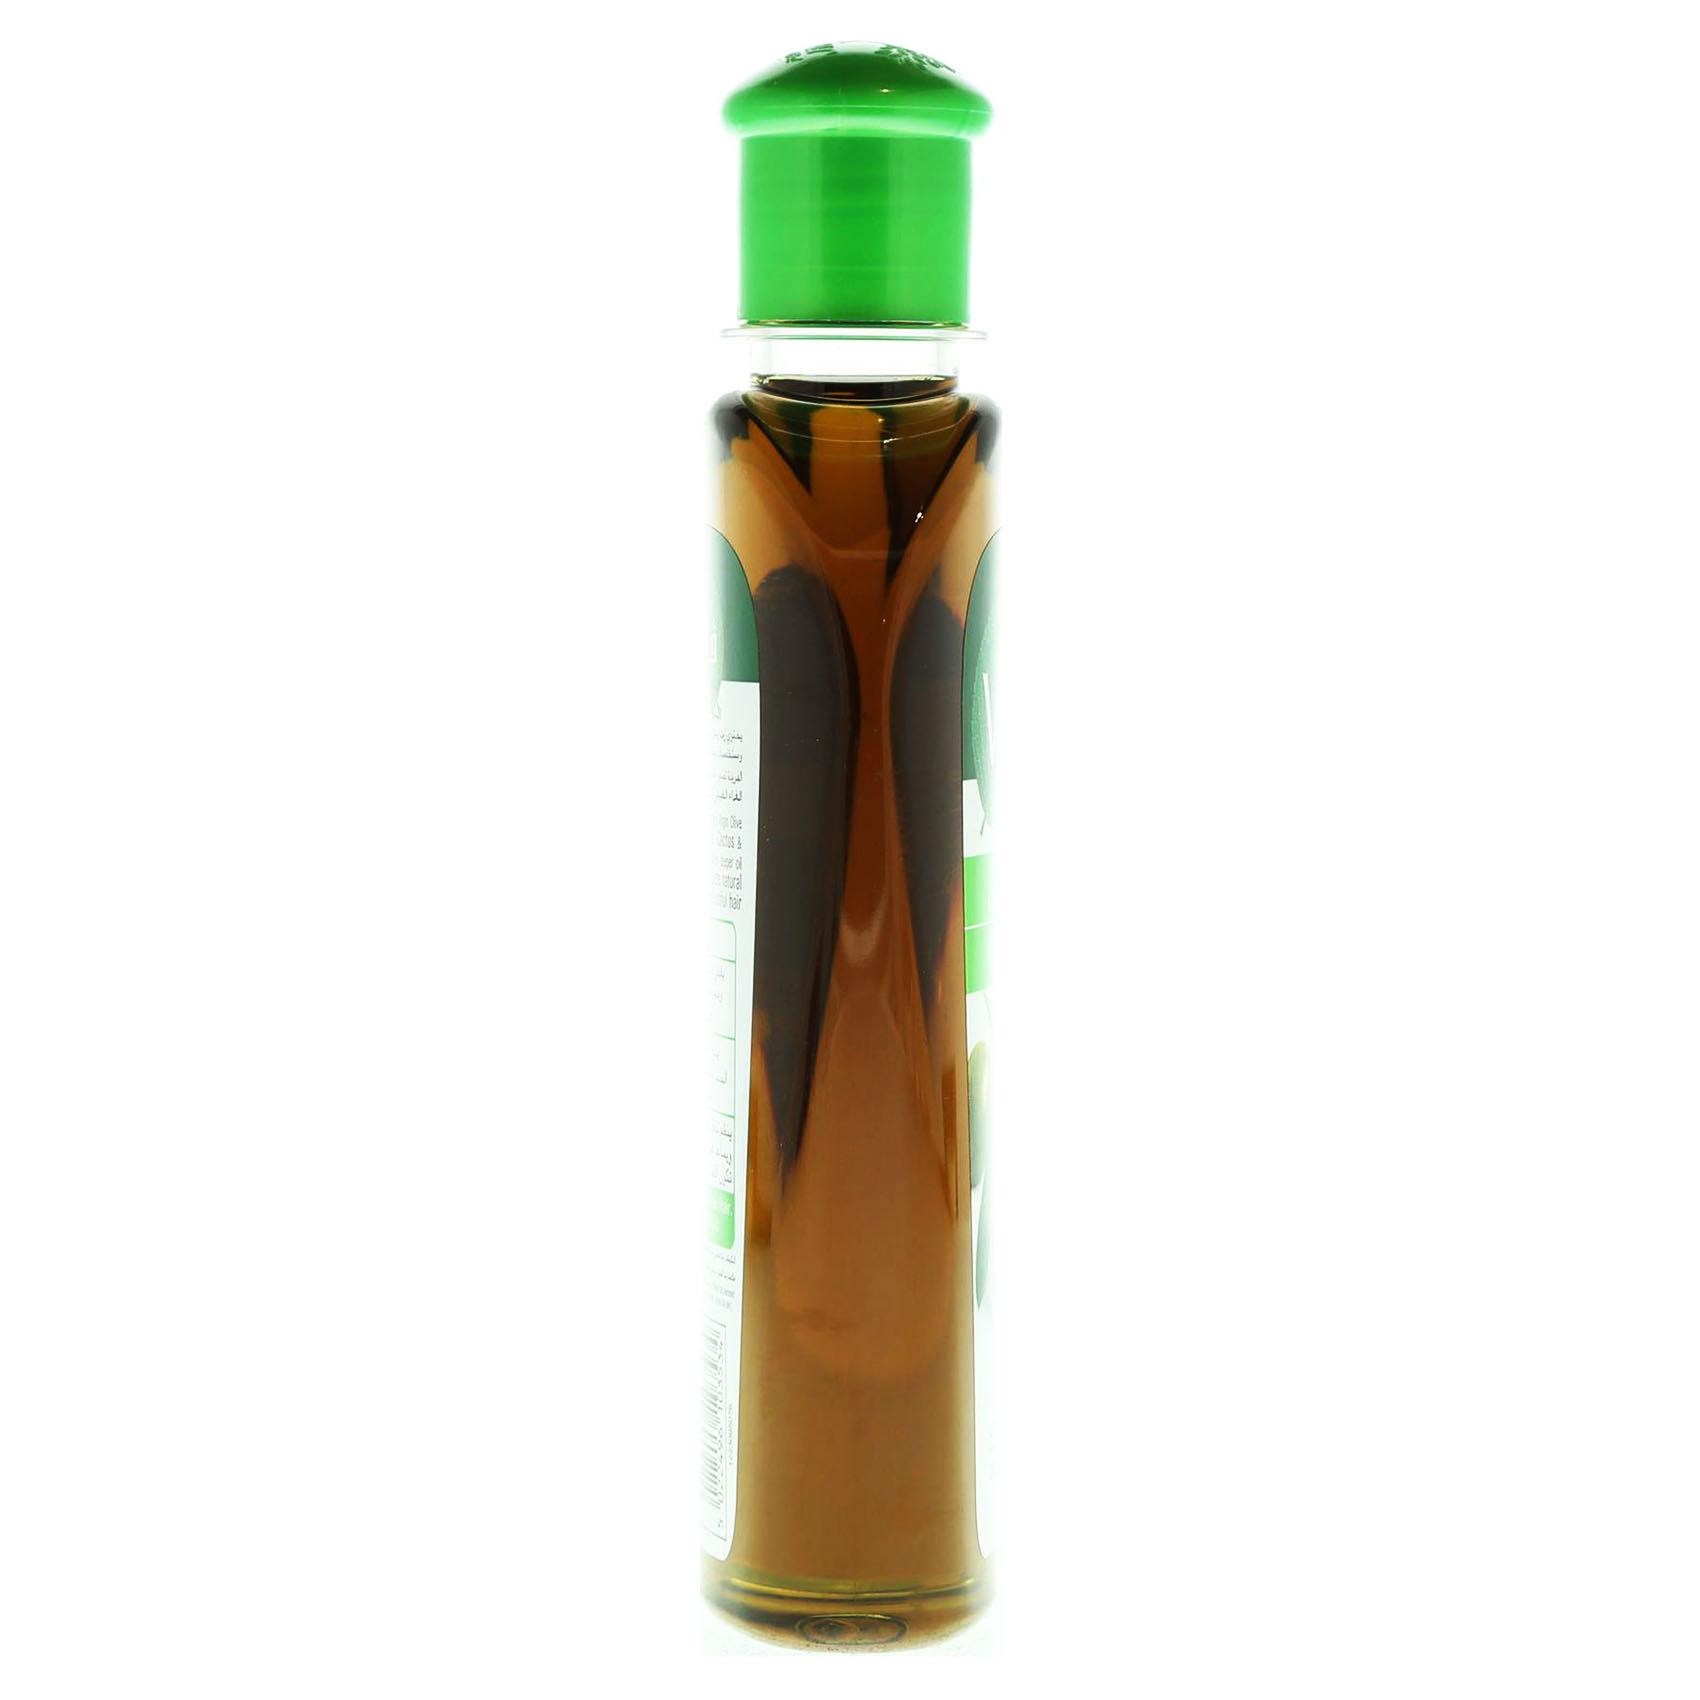 DABUR HAIR OIL OLIVE 200ML